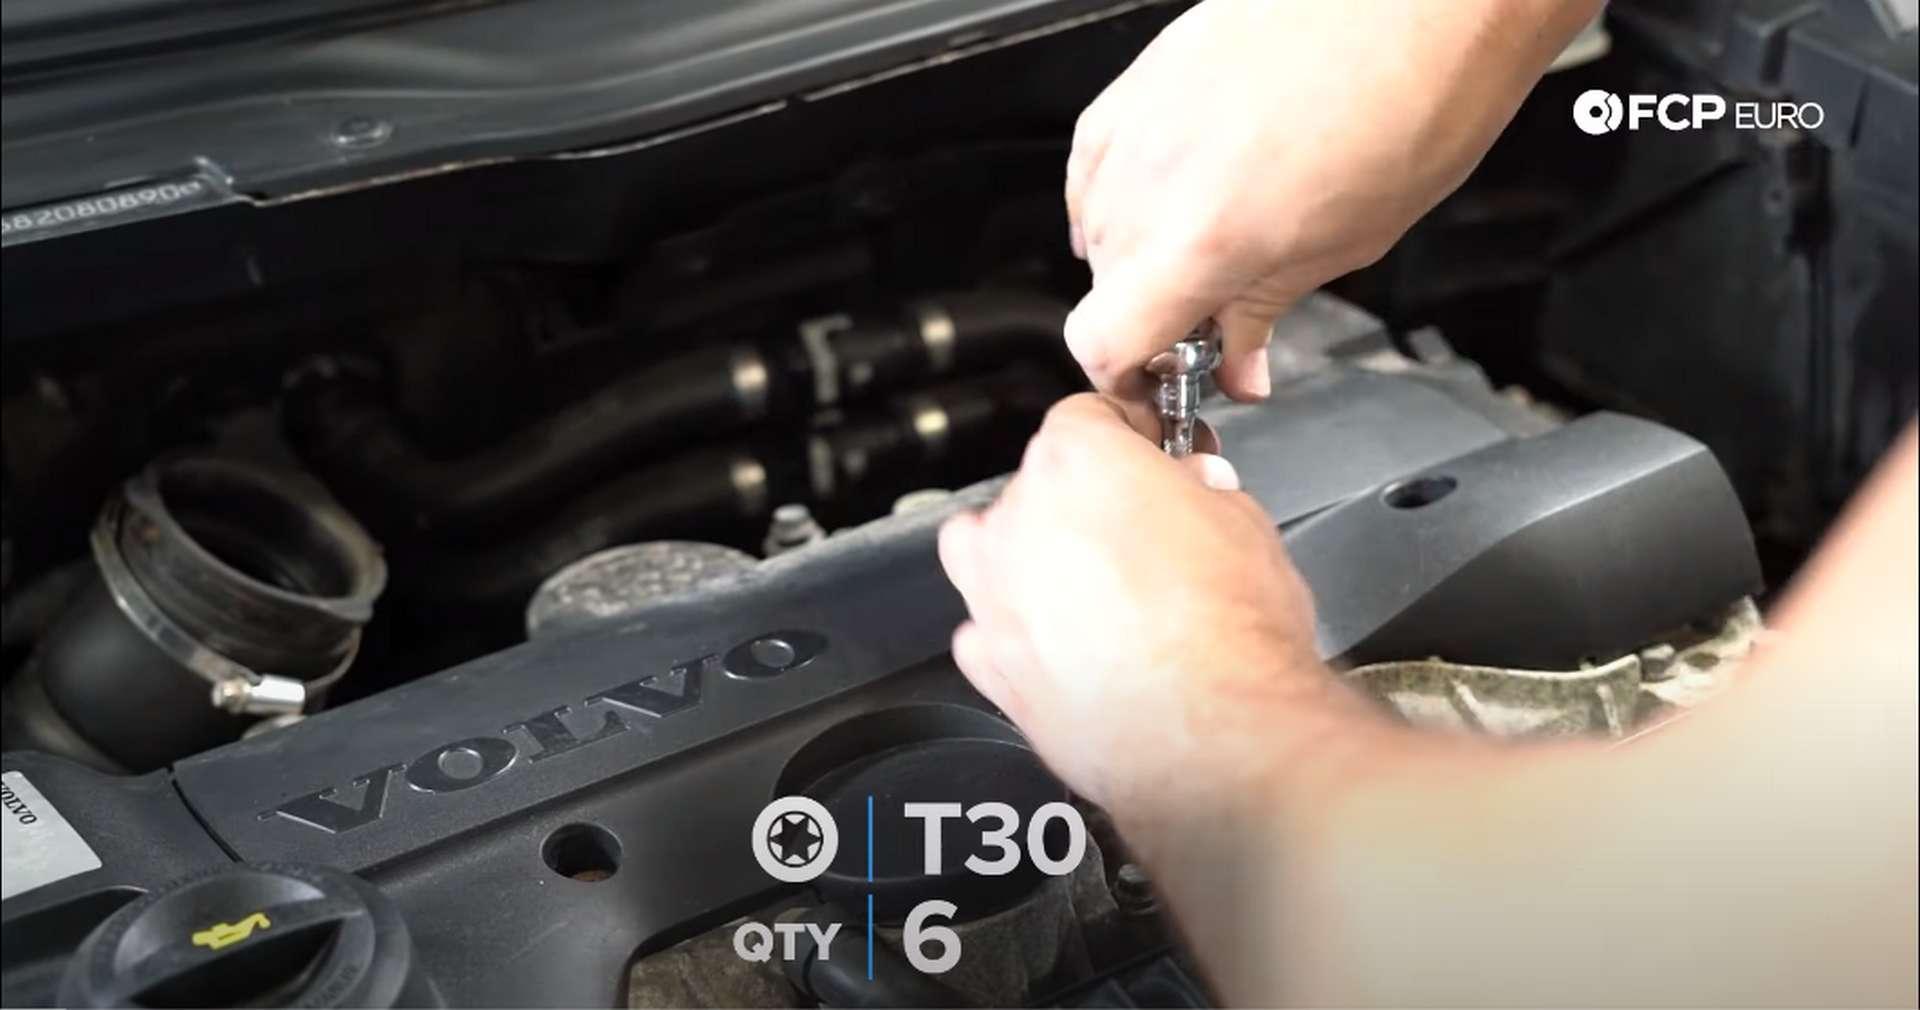 DIY Volvo PCV ignition coil cover removal